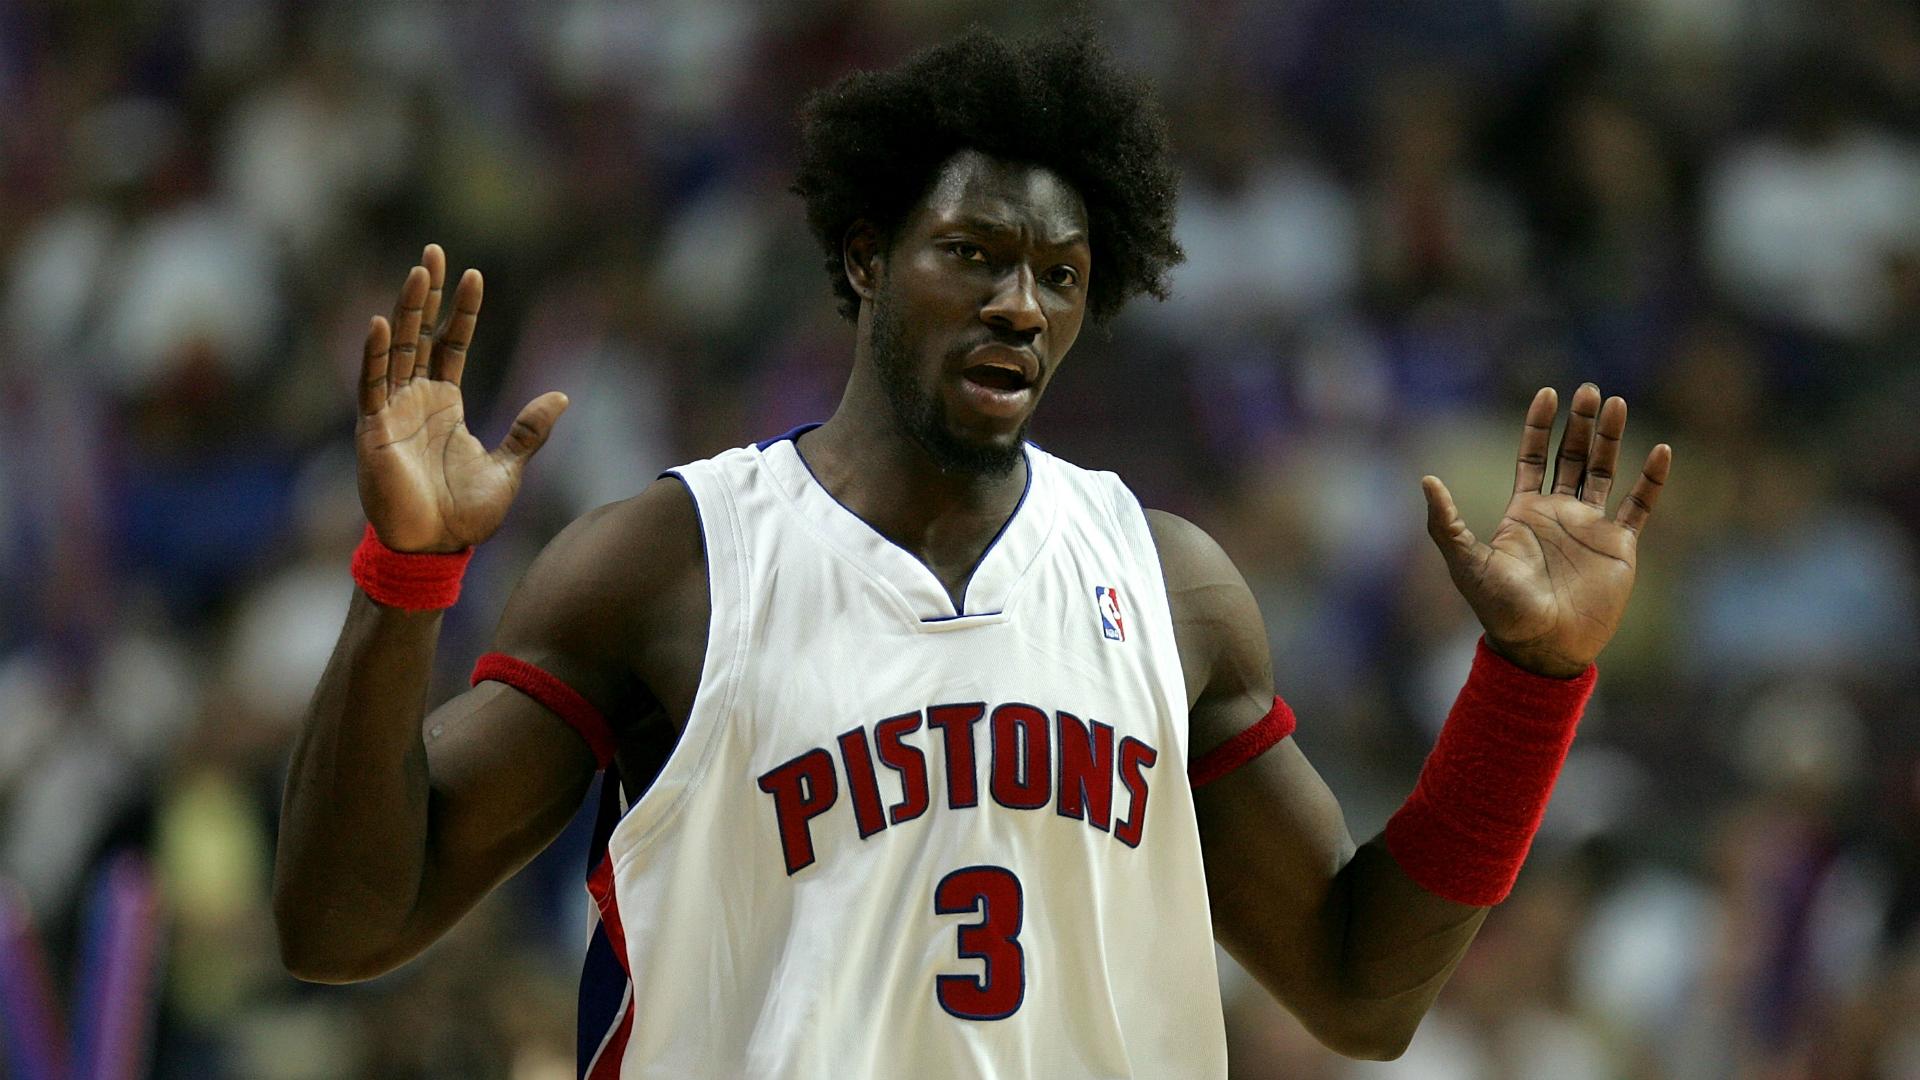 Twitter admits Pistons Ben Wallace to winning Detroit NBA Draft lottery